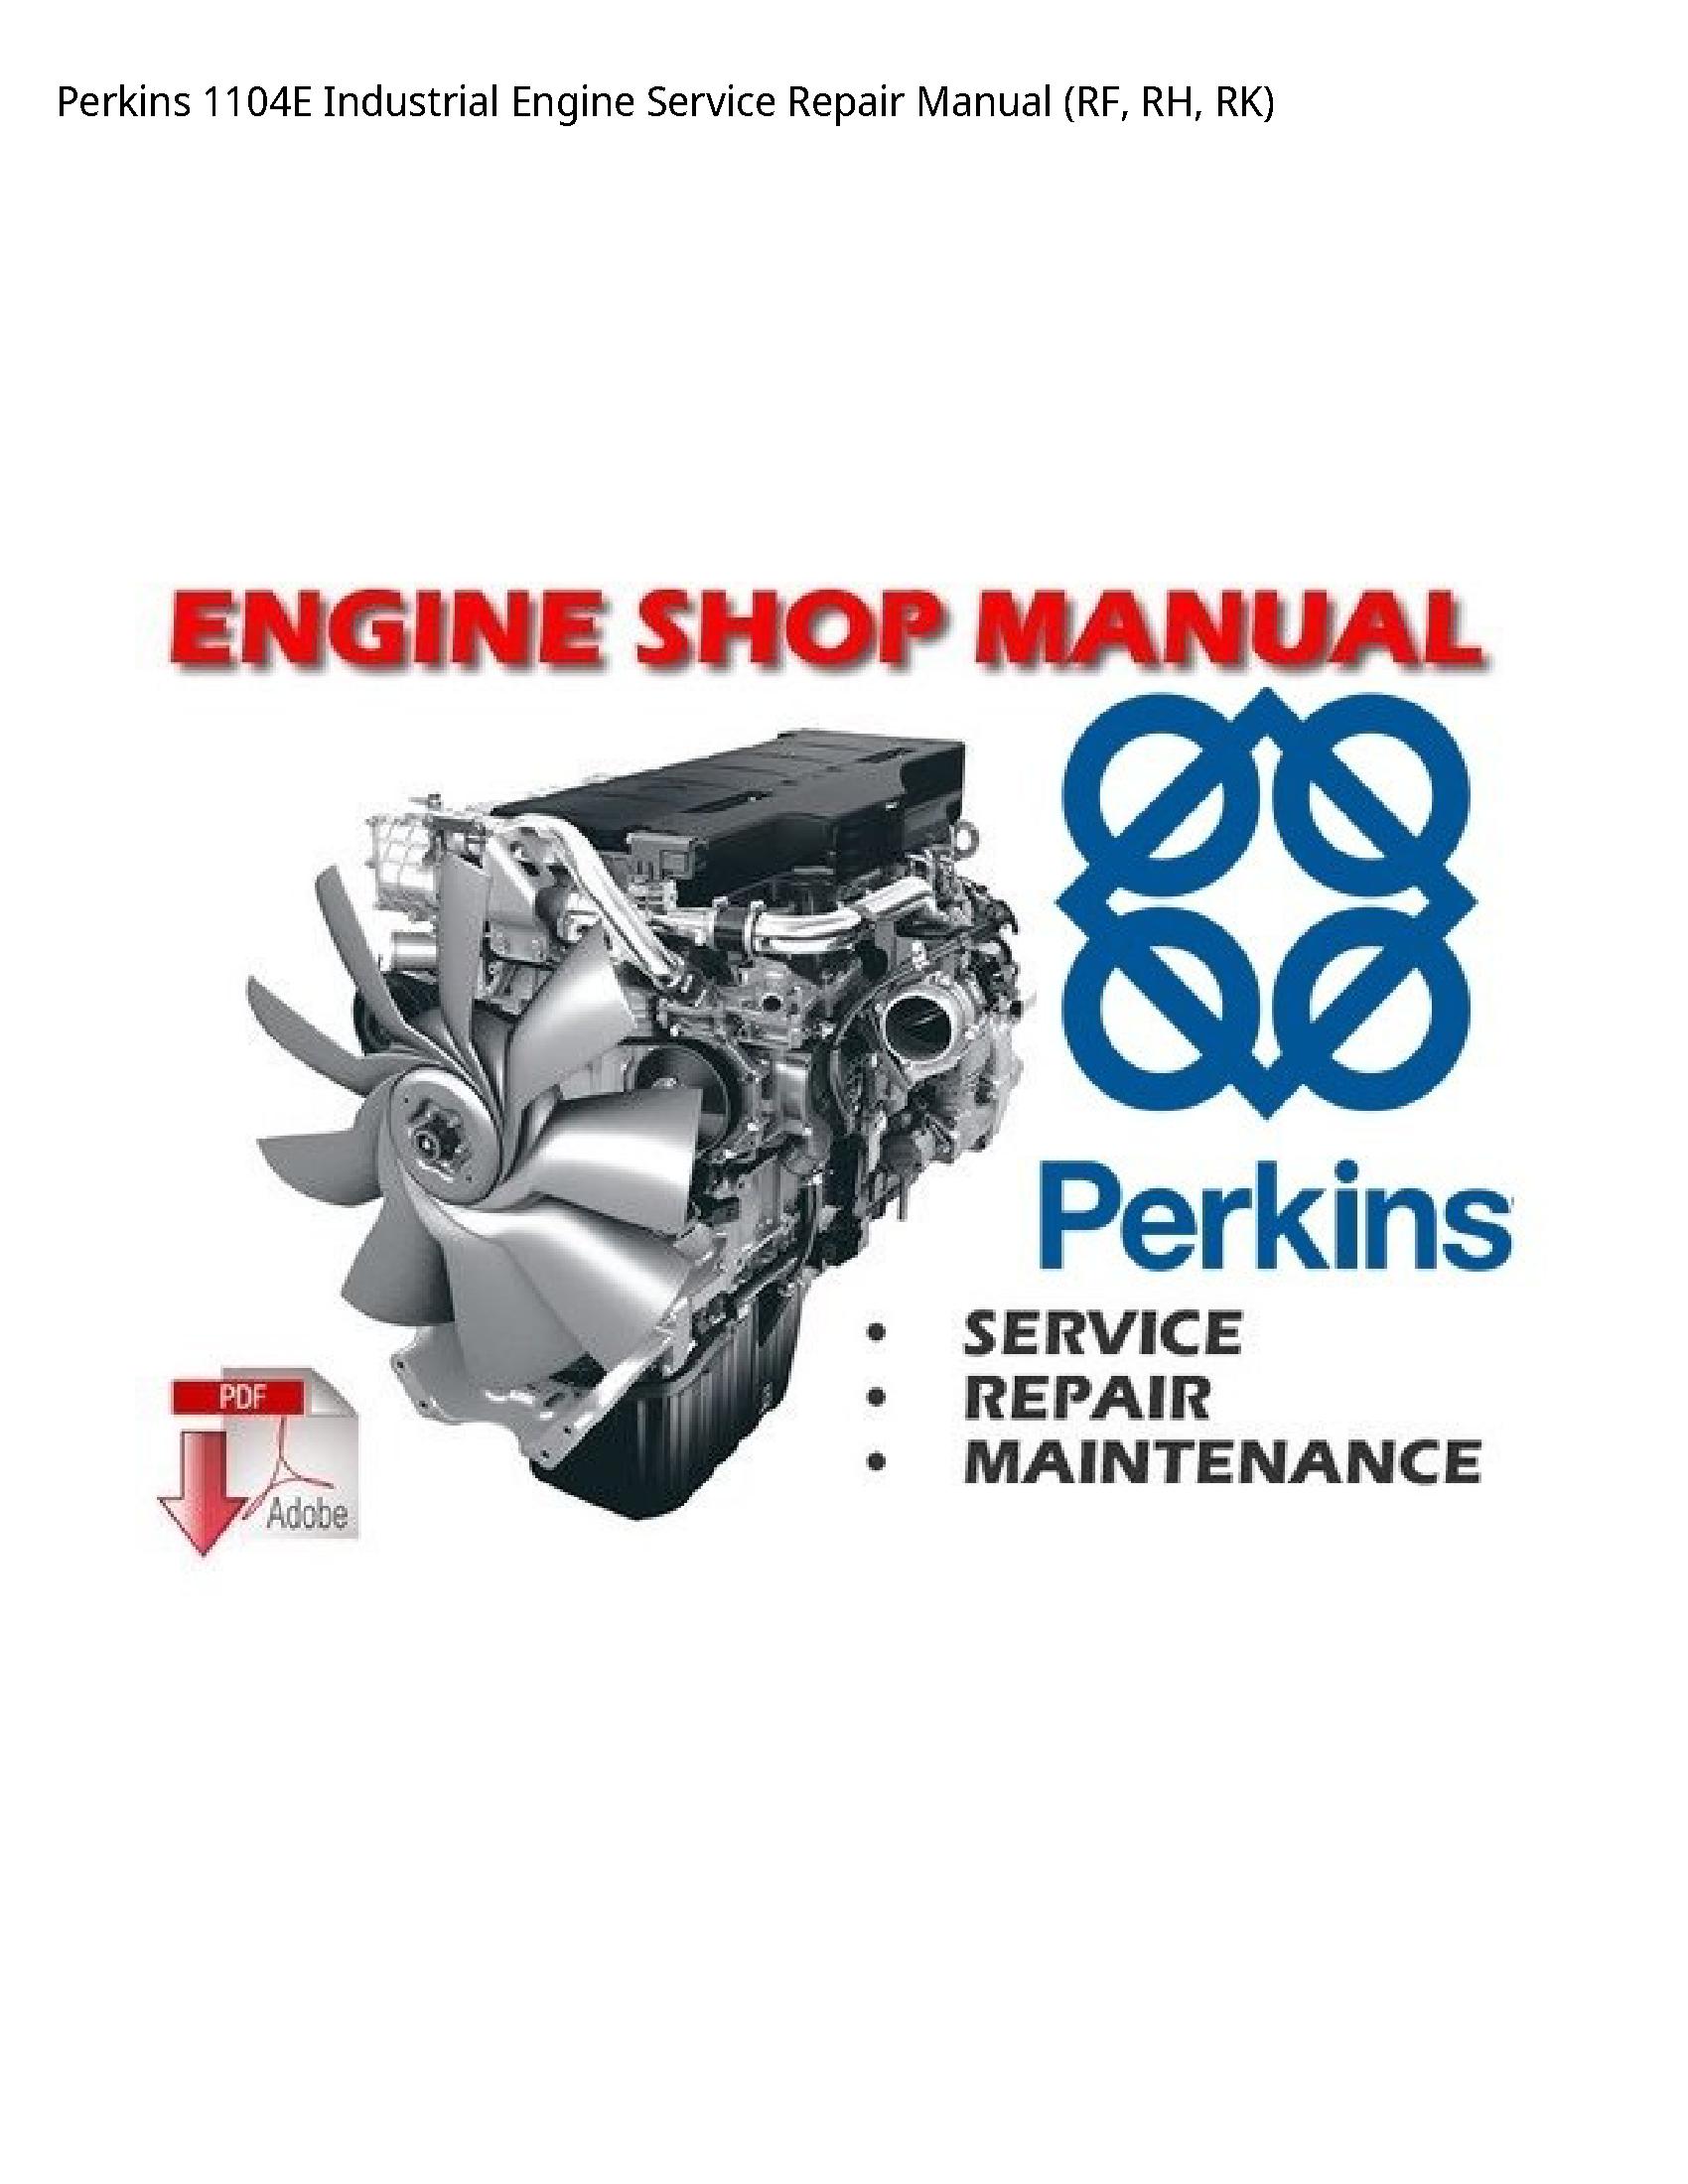 Perkins 1104E Industrial Engine manual